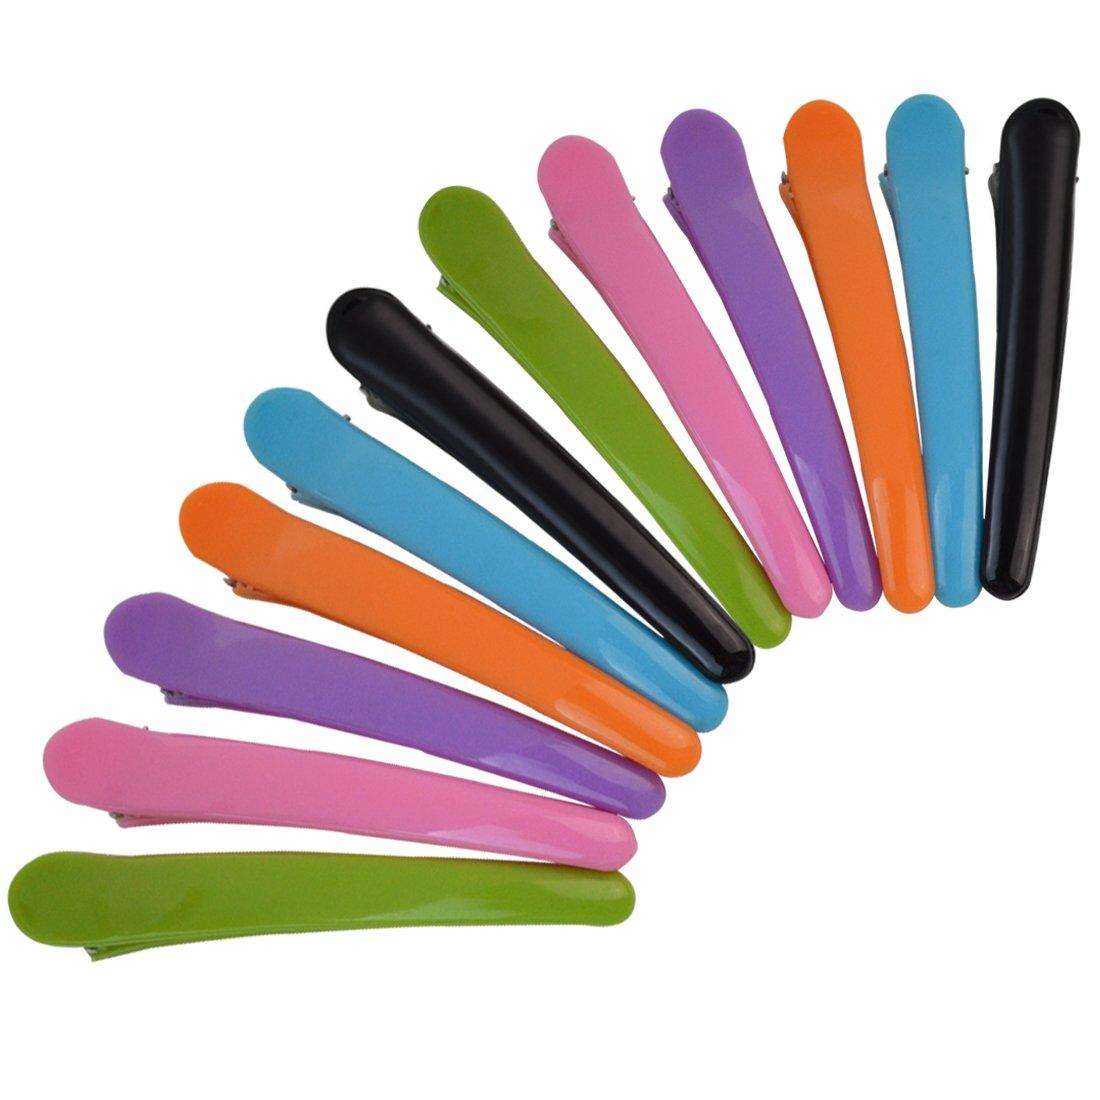 Rbenxia Hair Clips 12pcs Large 11.5cm Multicolor Plastic Duckbill Clips Hairpins Alligator Clip Hair Barrettes